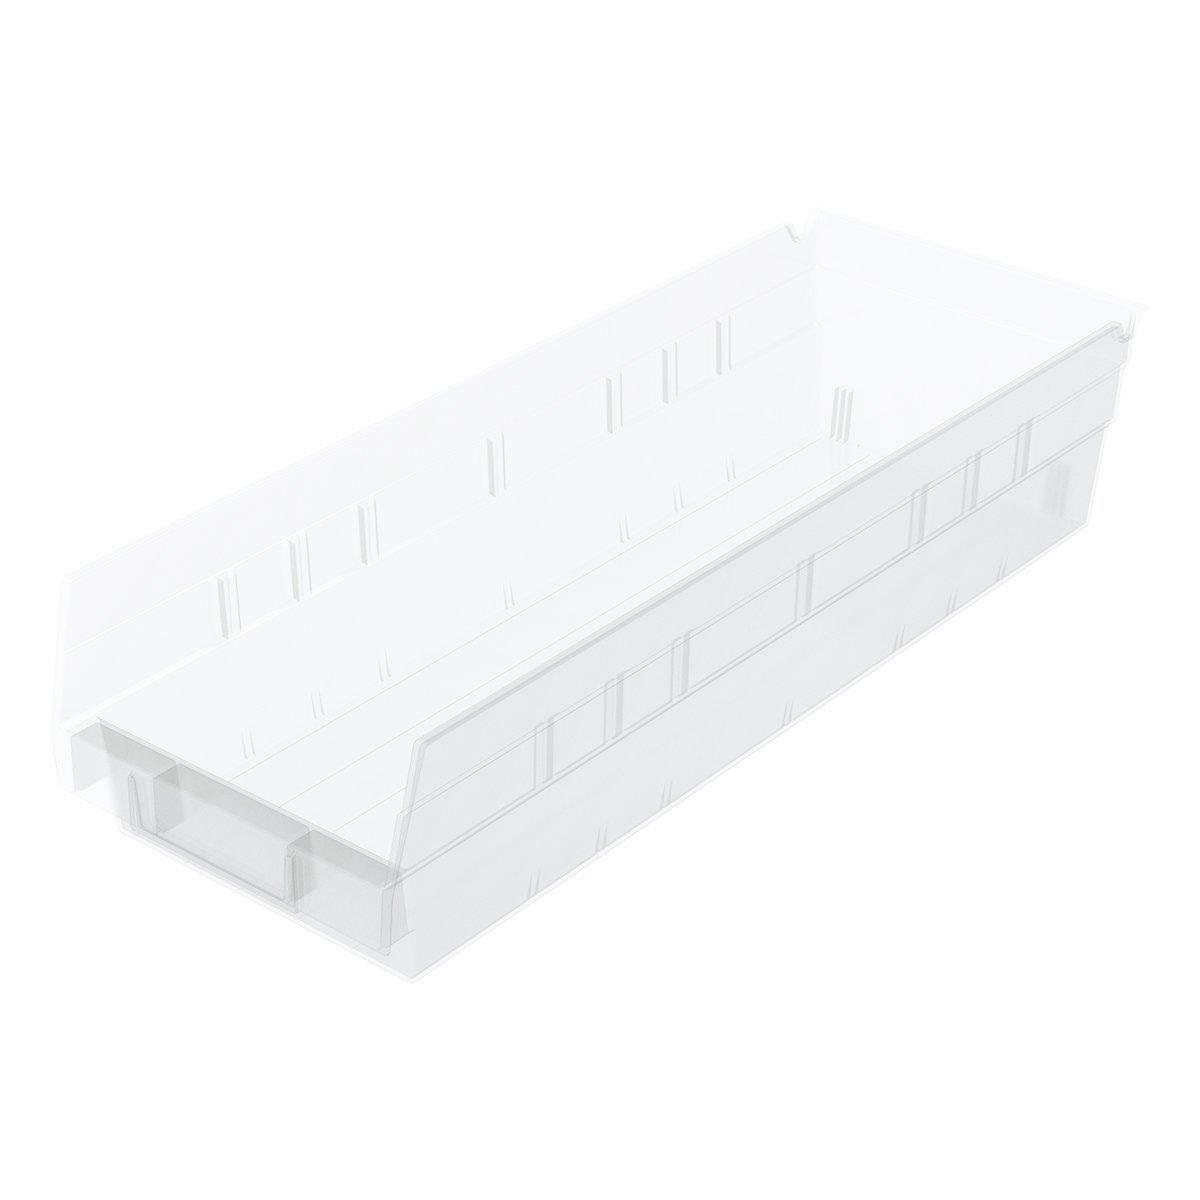 Akro-Mils 30138 18-Inch by 6-Inch by 4-Inch Clear Plastic Nesting Shelf Bin Box, 12-Pack